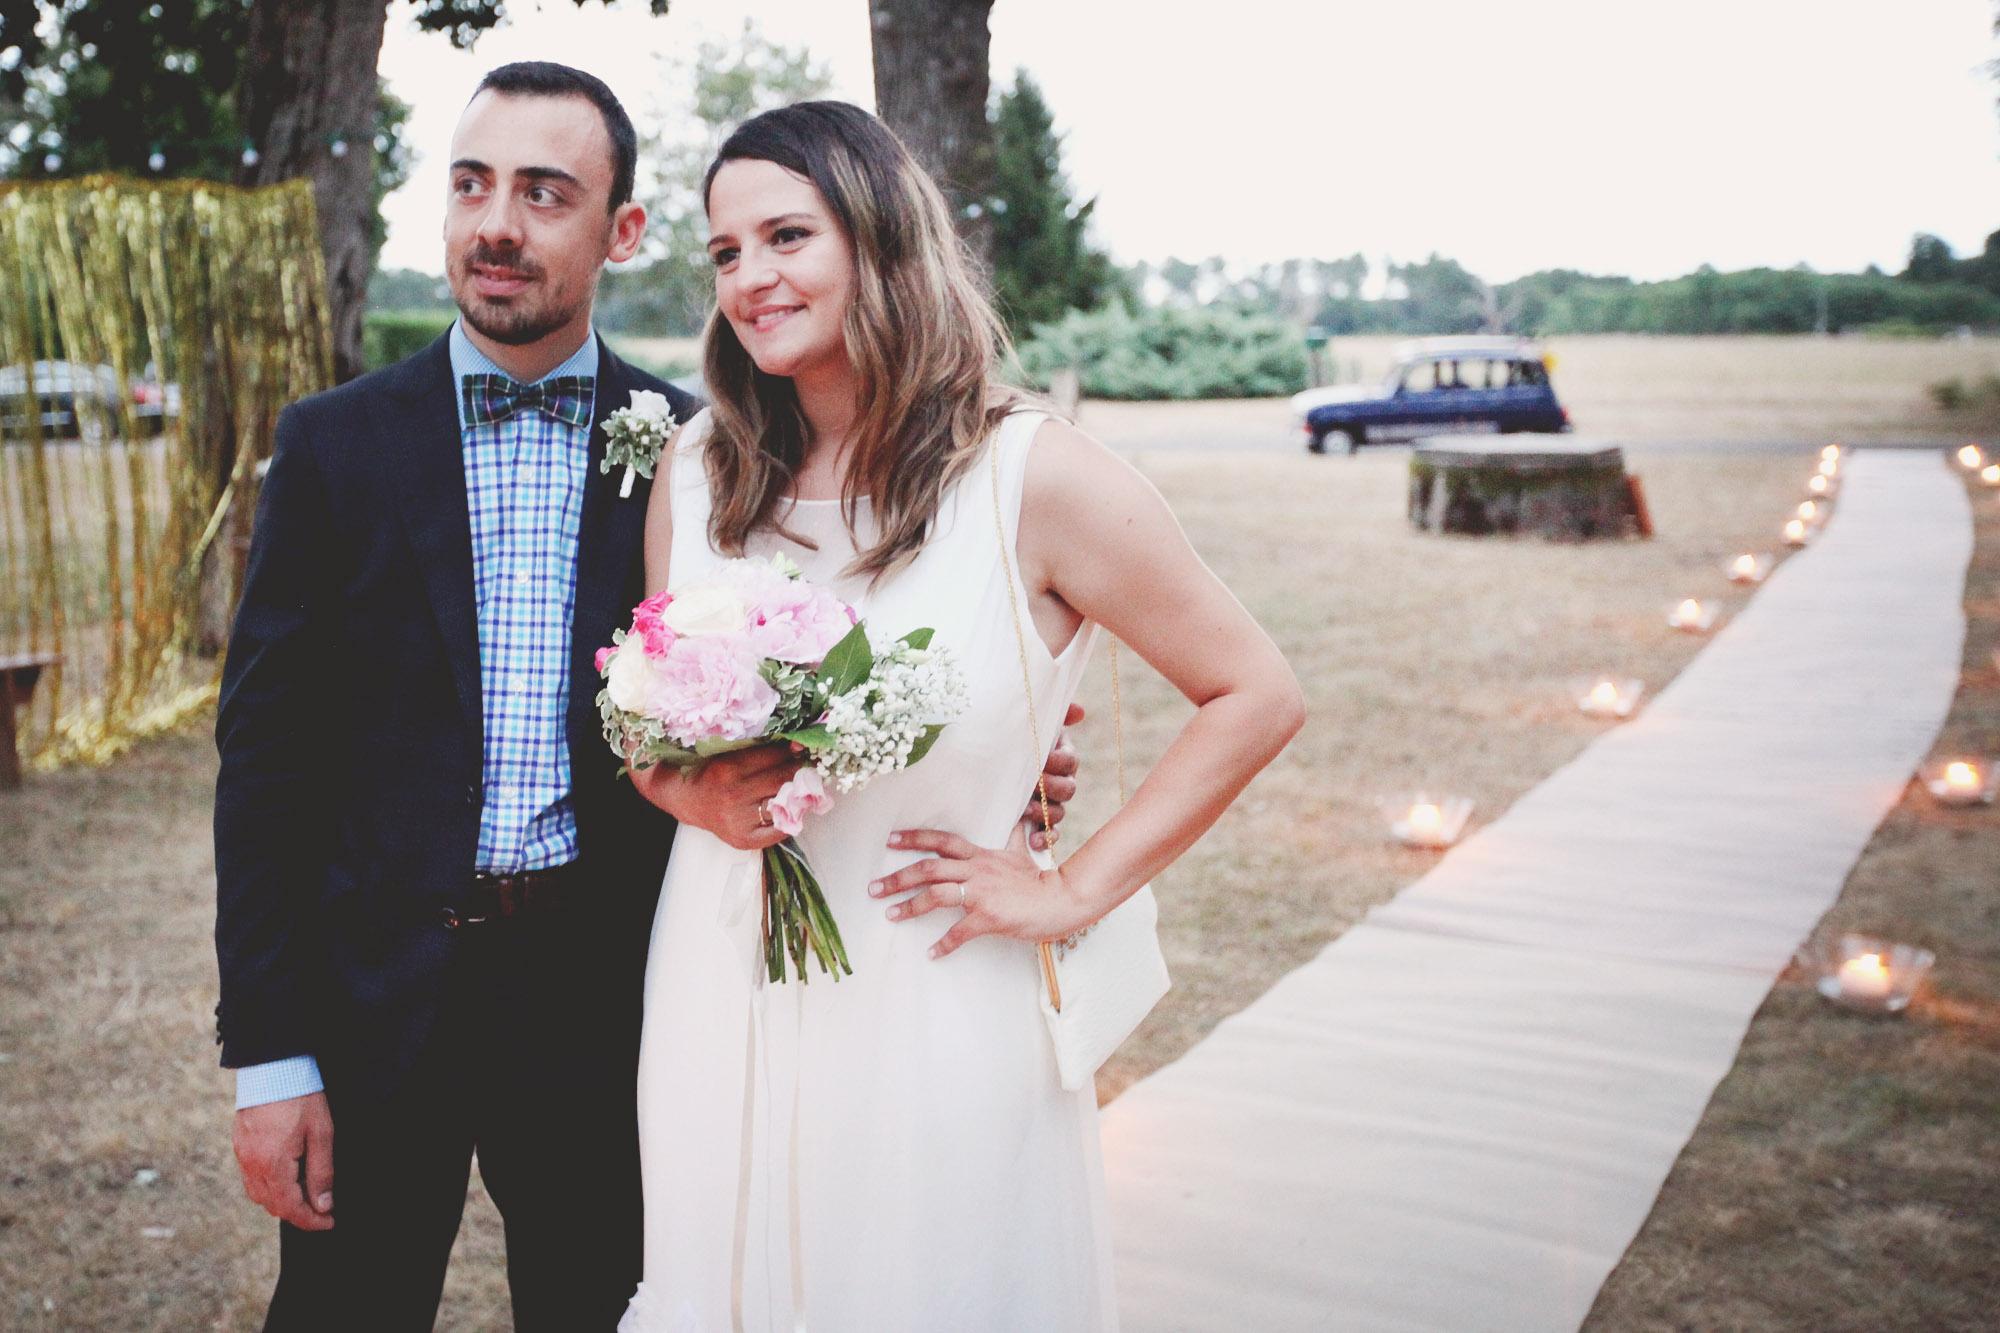 dcoration mariage champtre - Costume Mariage Champetre